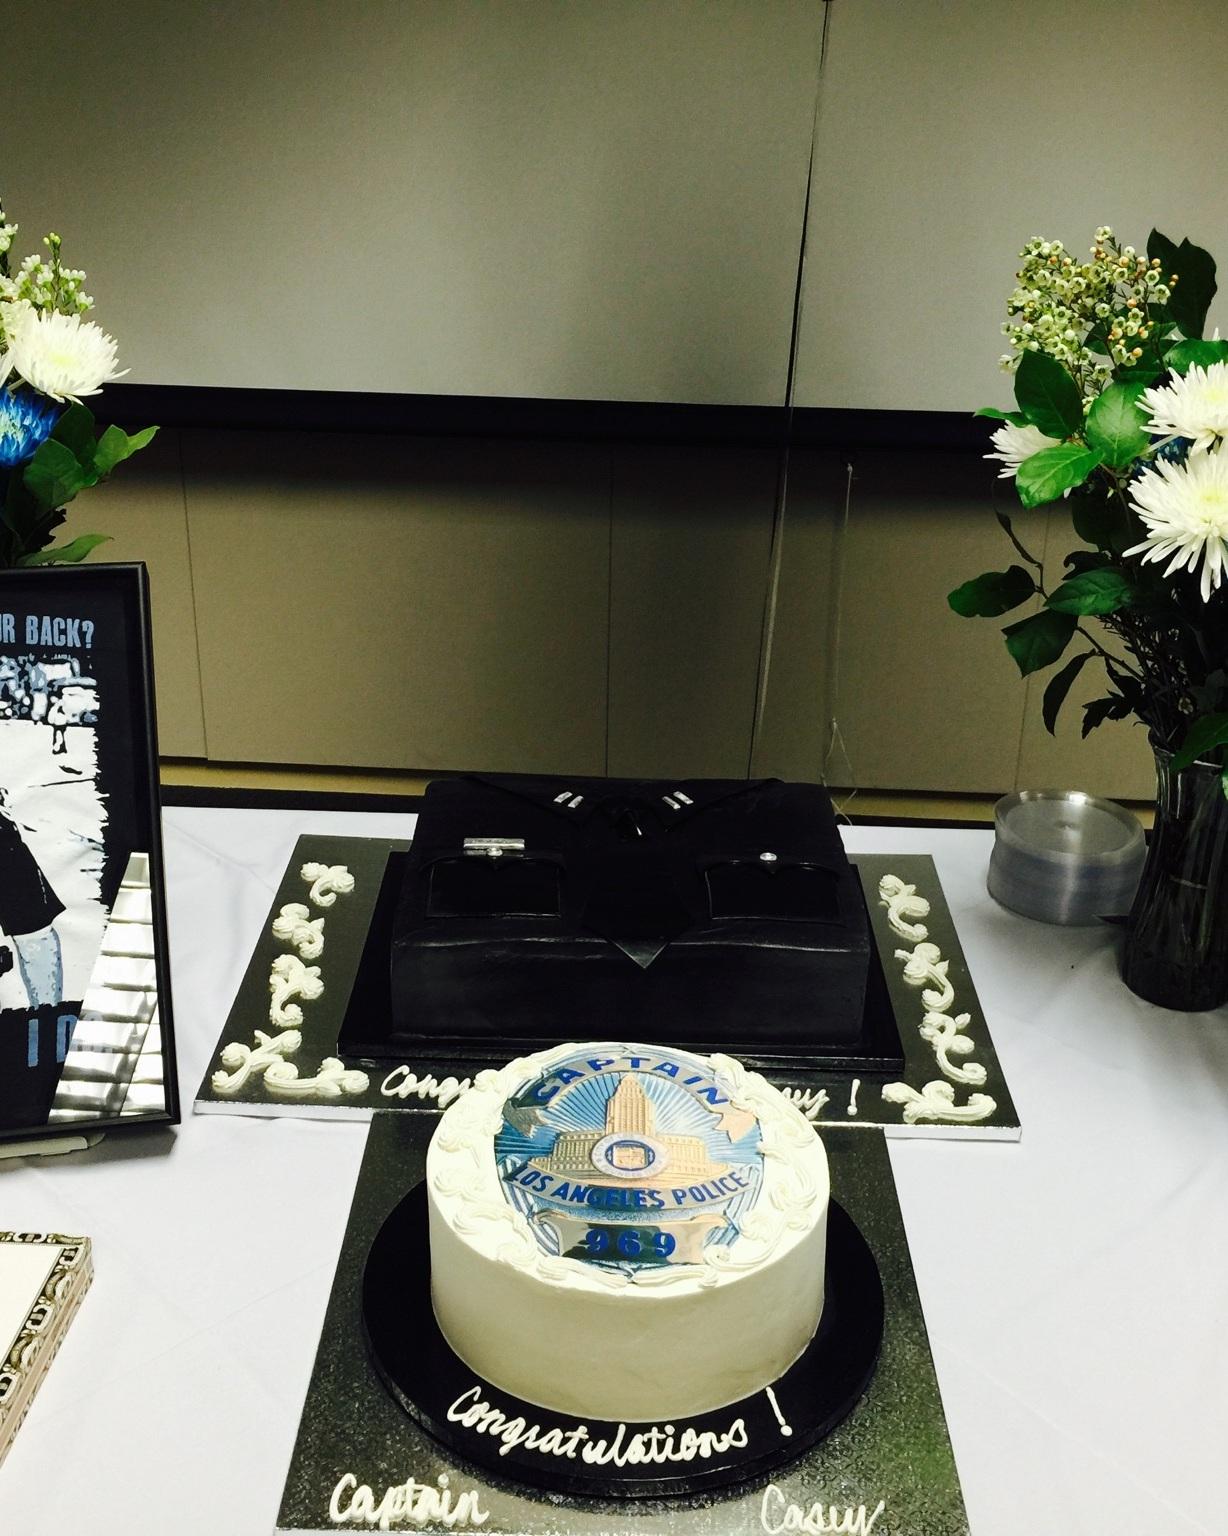 LAPD Promotion Cake - LAPD Uniform Cake - Mwokaji CAkery .JPG